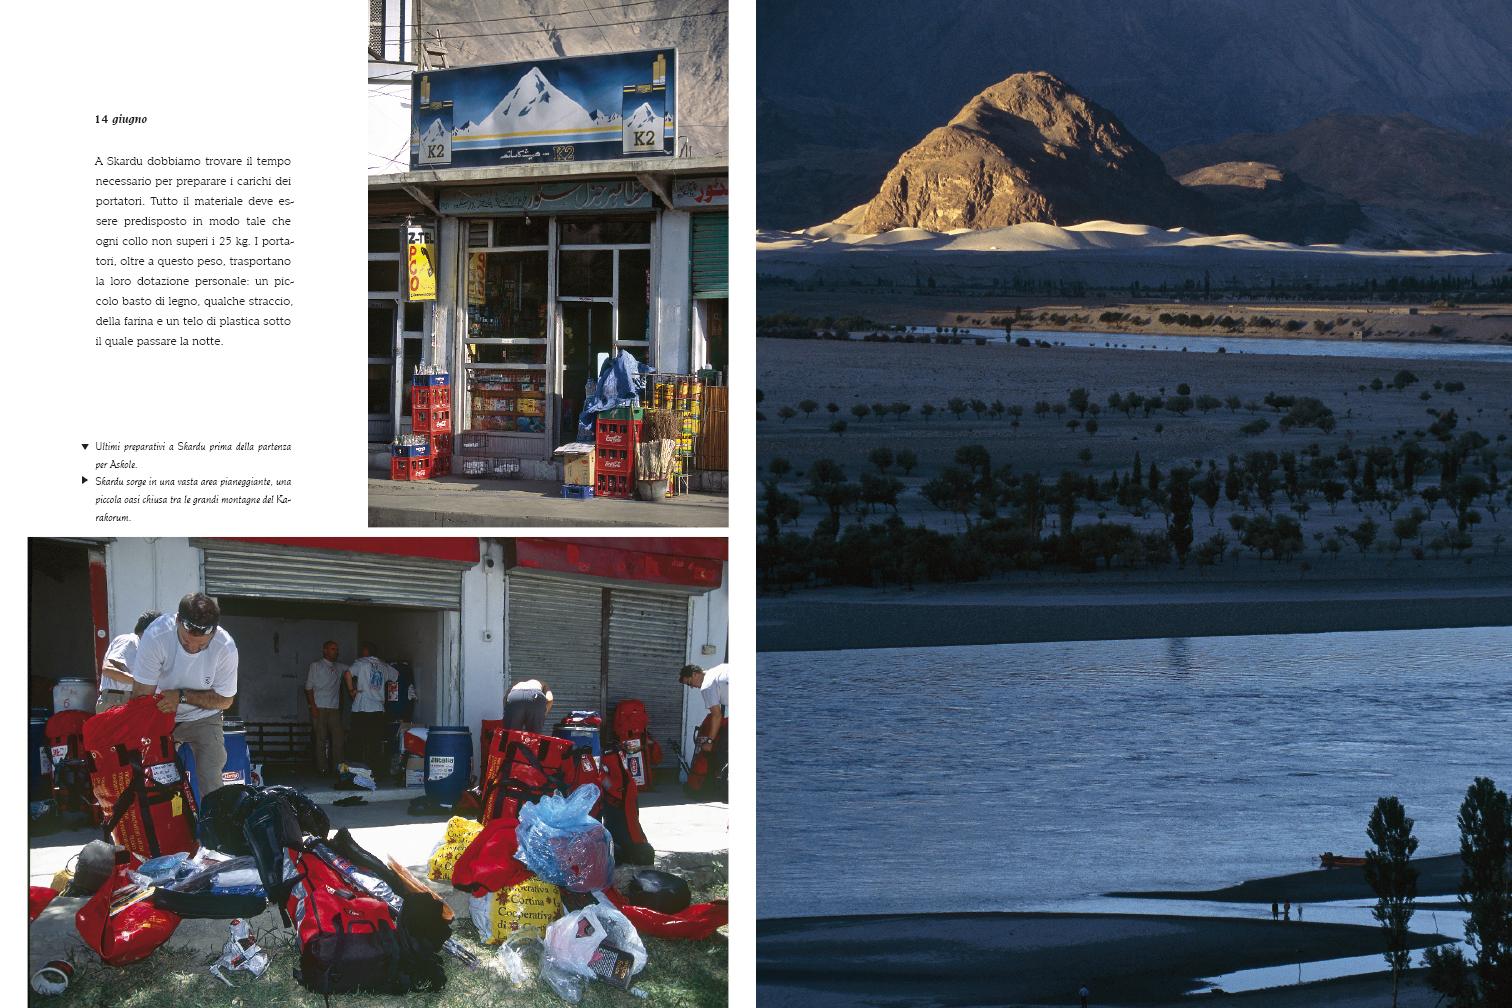 K2 EXPEDITION 1954-2004 Giuseppe Ghedina Fotografo - 024.jpg